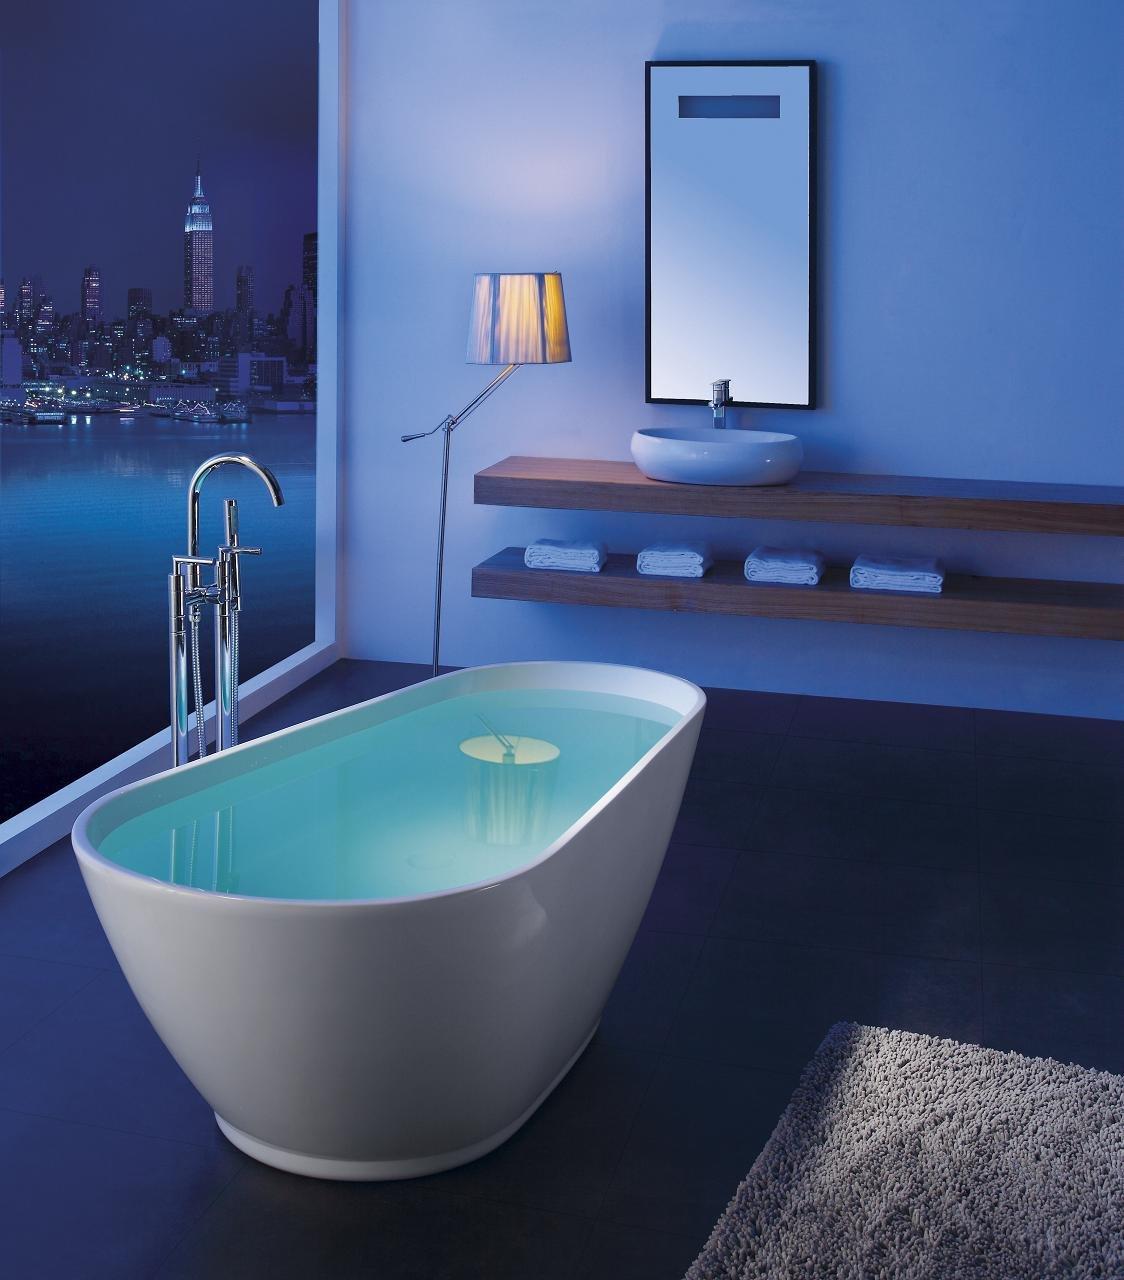 Amazon.com: Modern Bathtub - Soaking Bathtub - Freestanding Bathtub ...